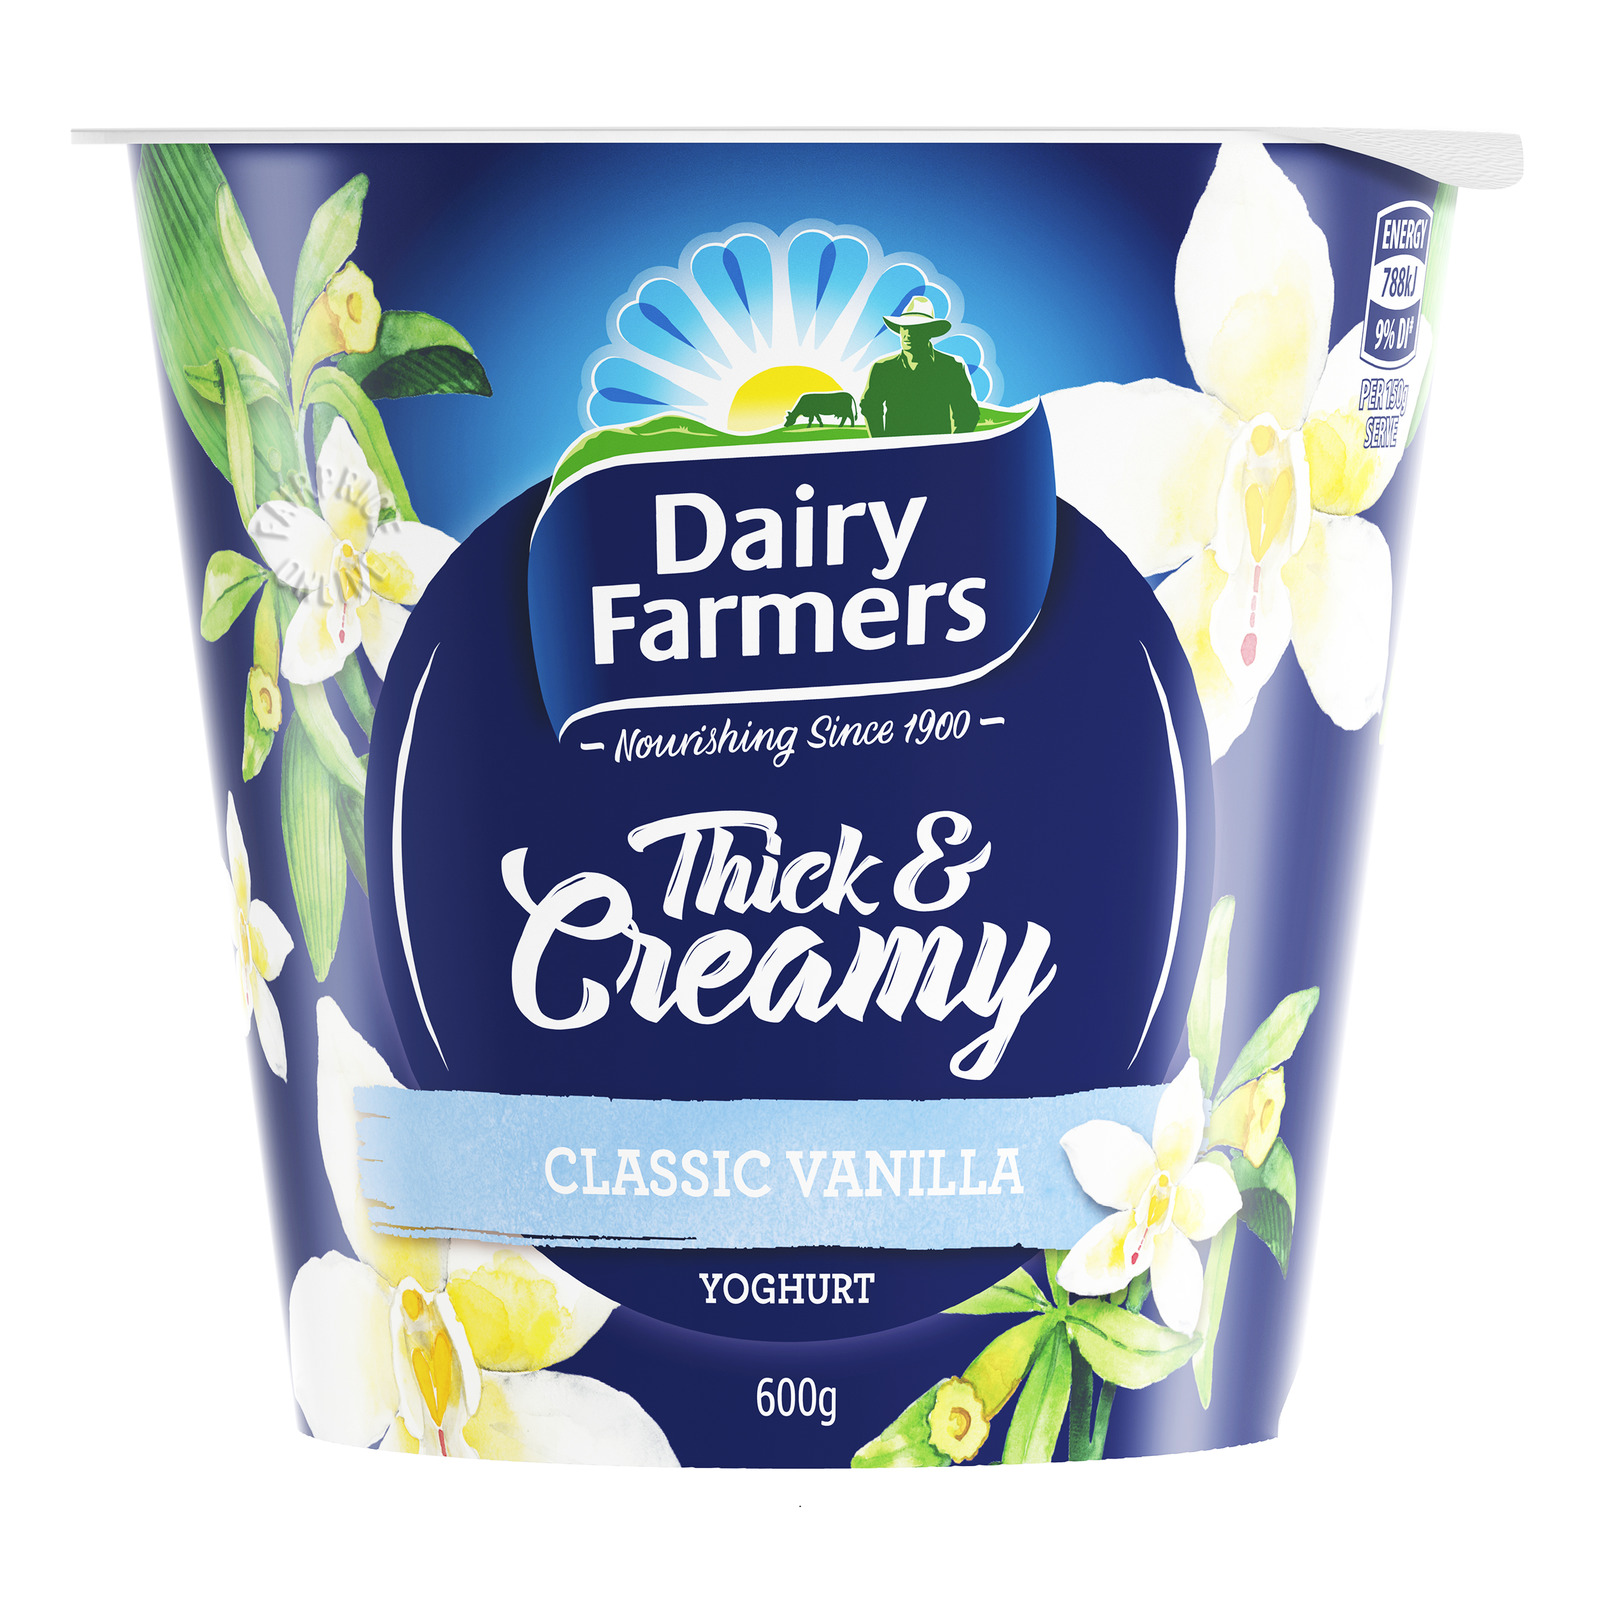 Dairy Farmers Thick & Creamy Yoghurt - Classic Vanilla